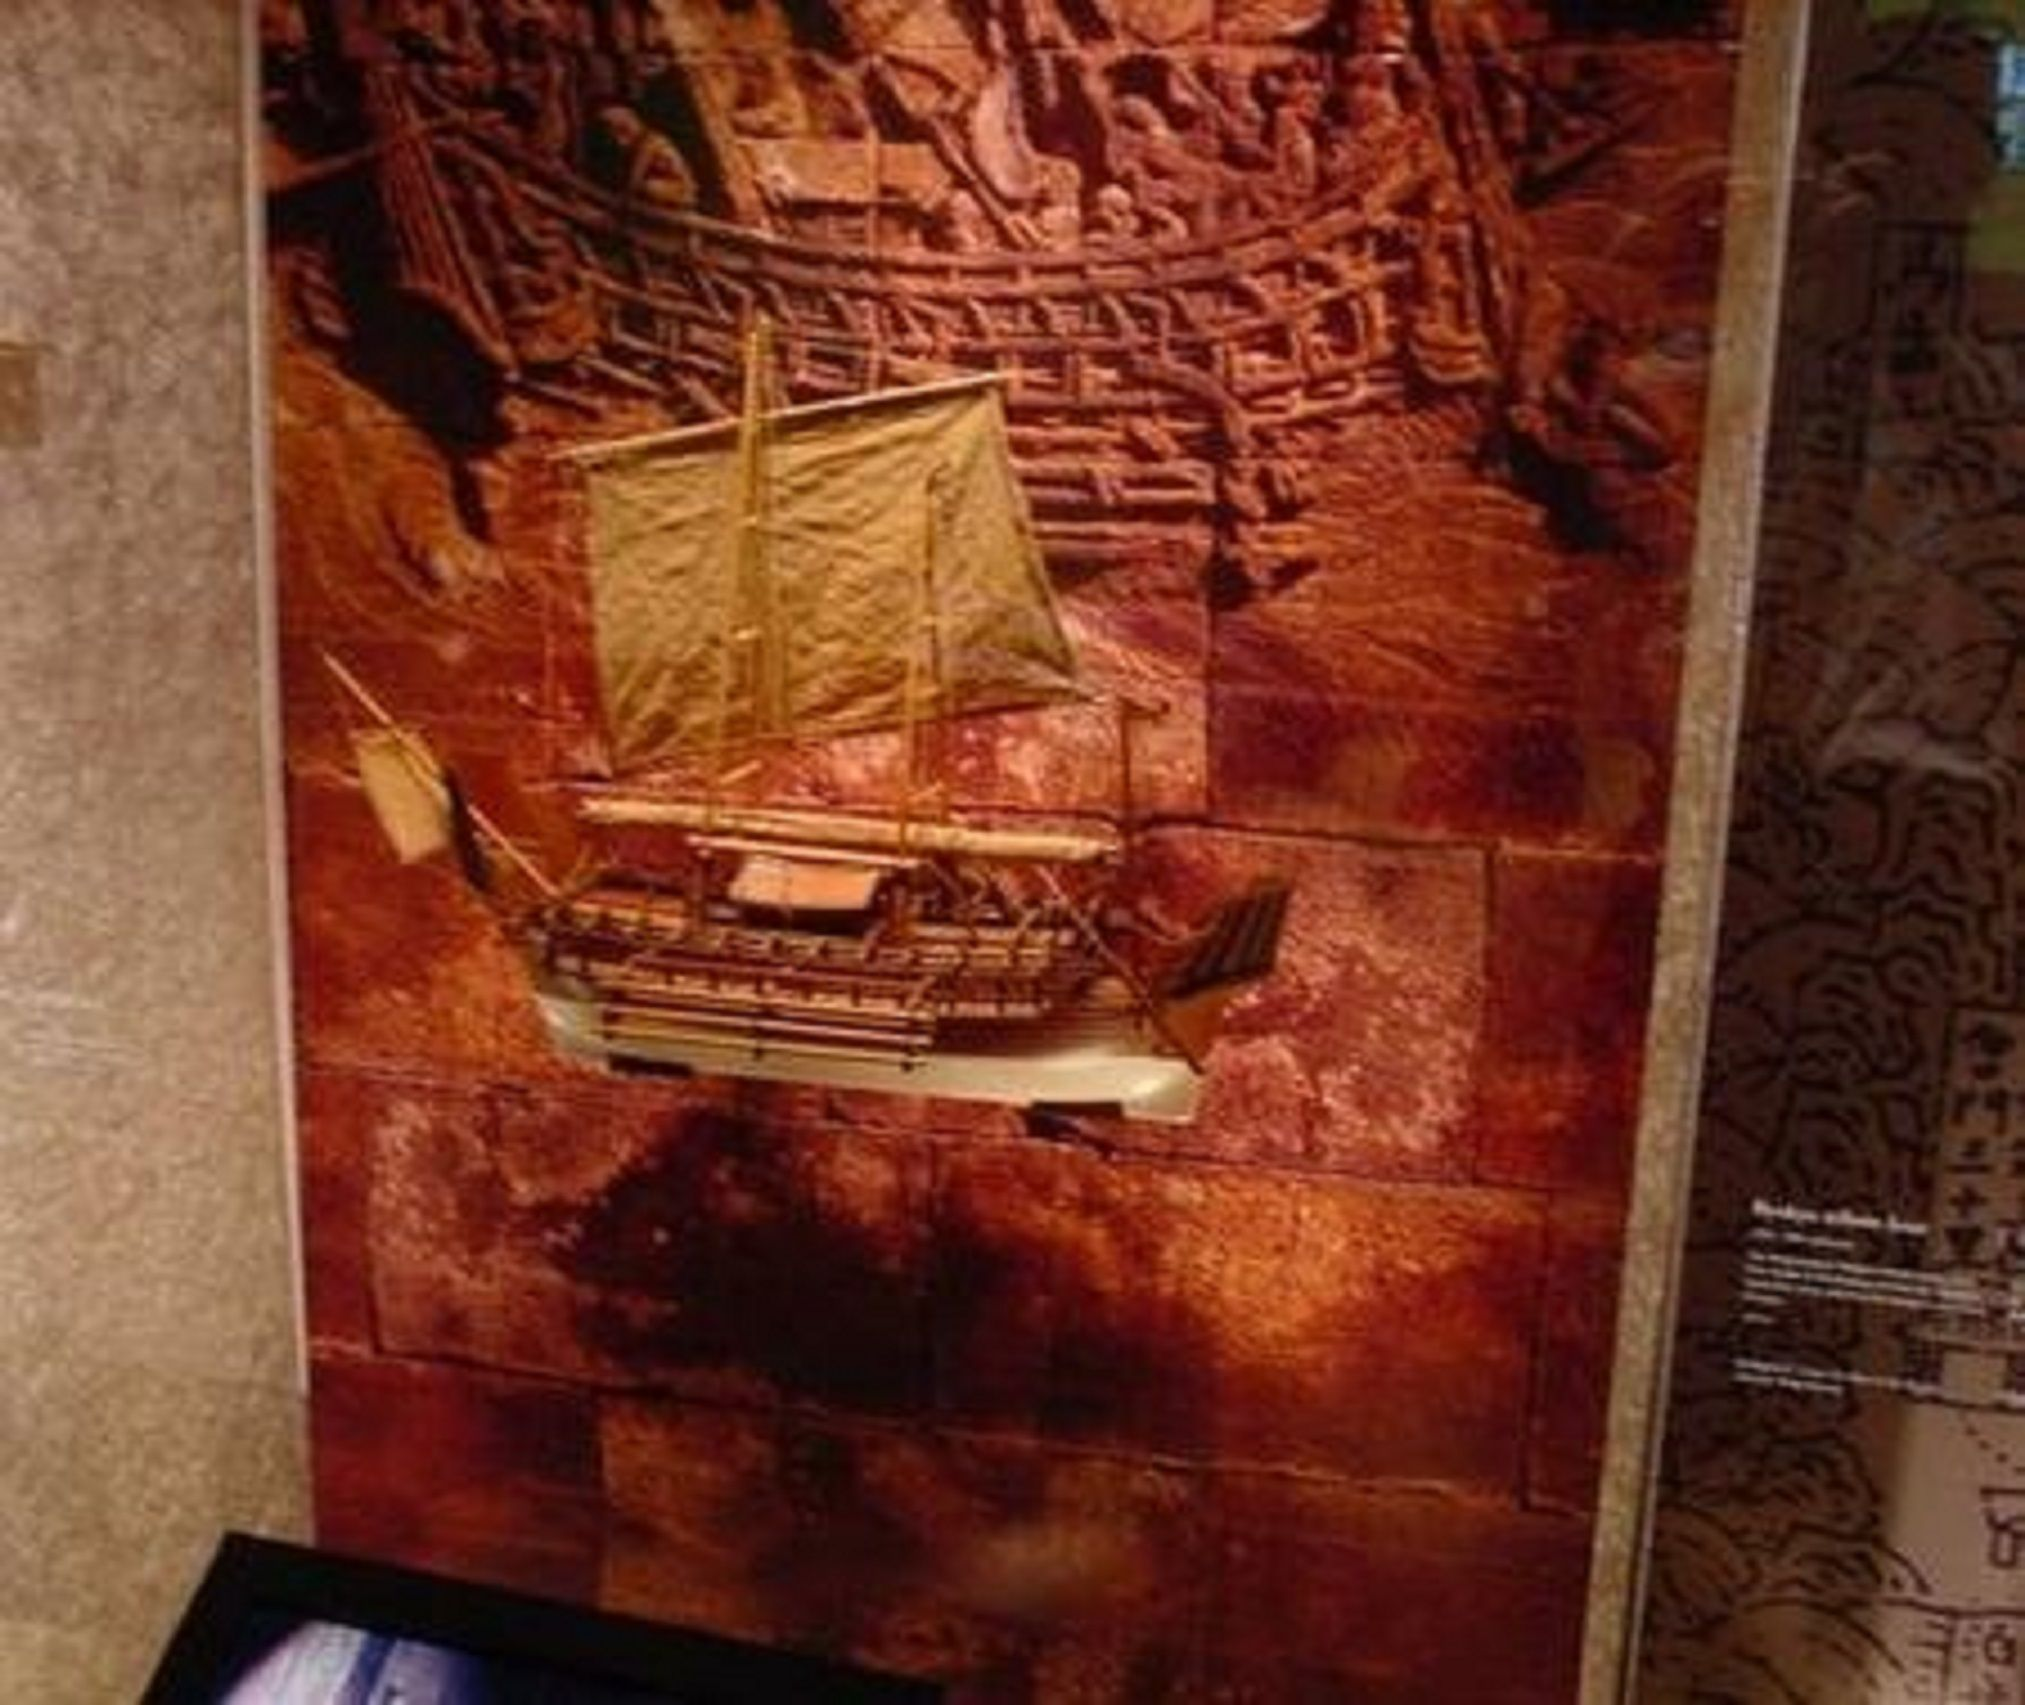 229-6979-Borobudur-model-ship-Premier-Range